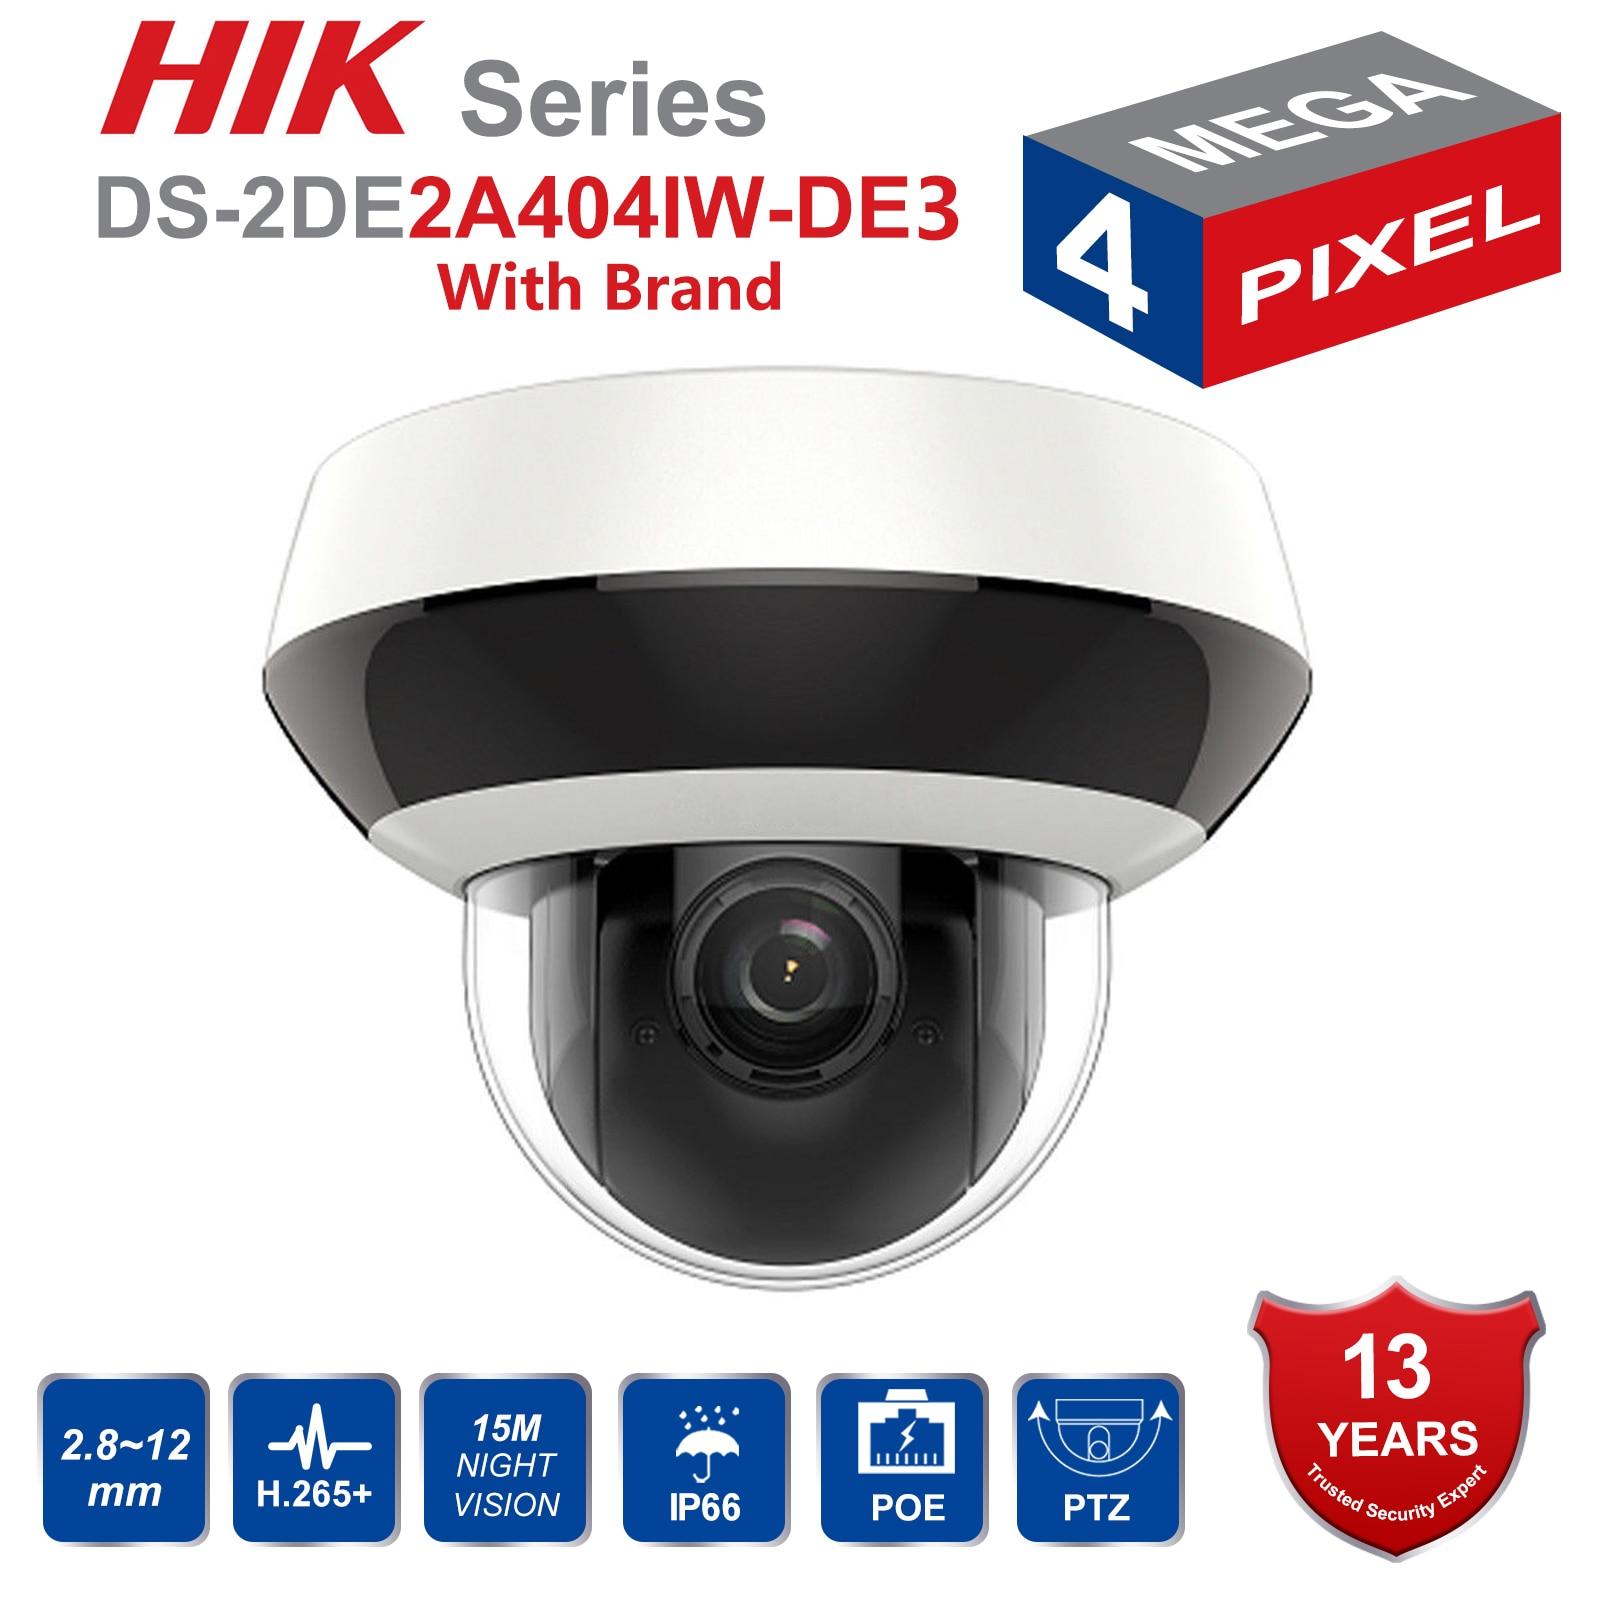 Hik PTZ IP Camera H.265 DS-2DE2A404IW-DE3 4MP 4X Zoom 2.8-12mm Lens Network Video Surveillance POE Dome CCTV Camera Audio